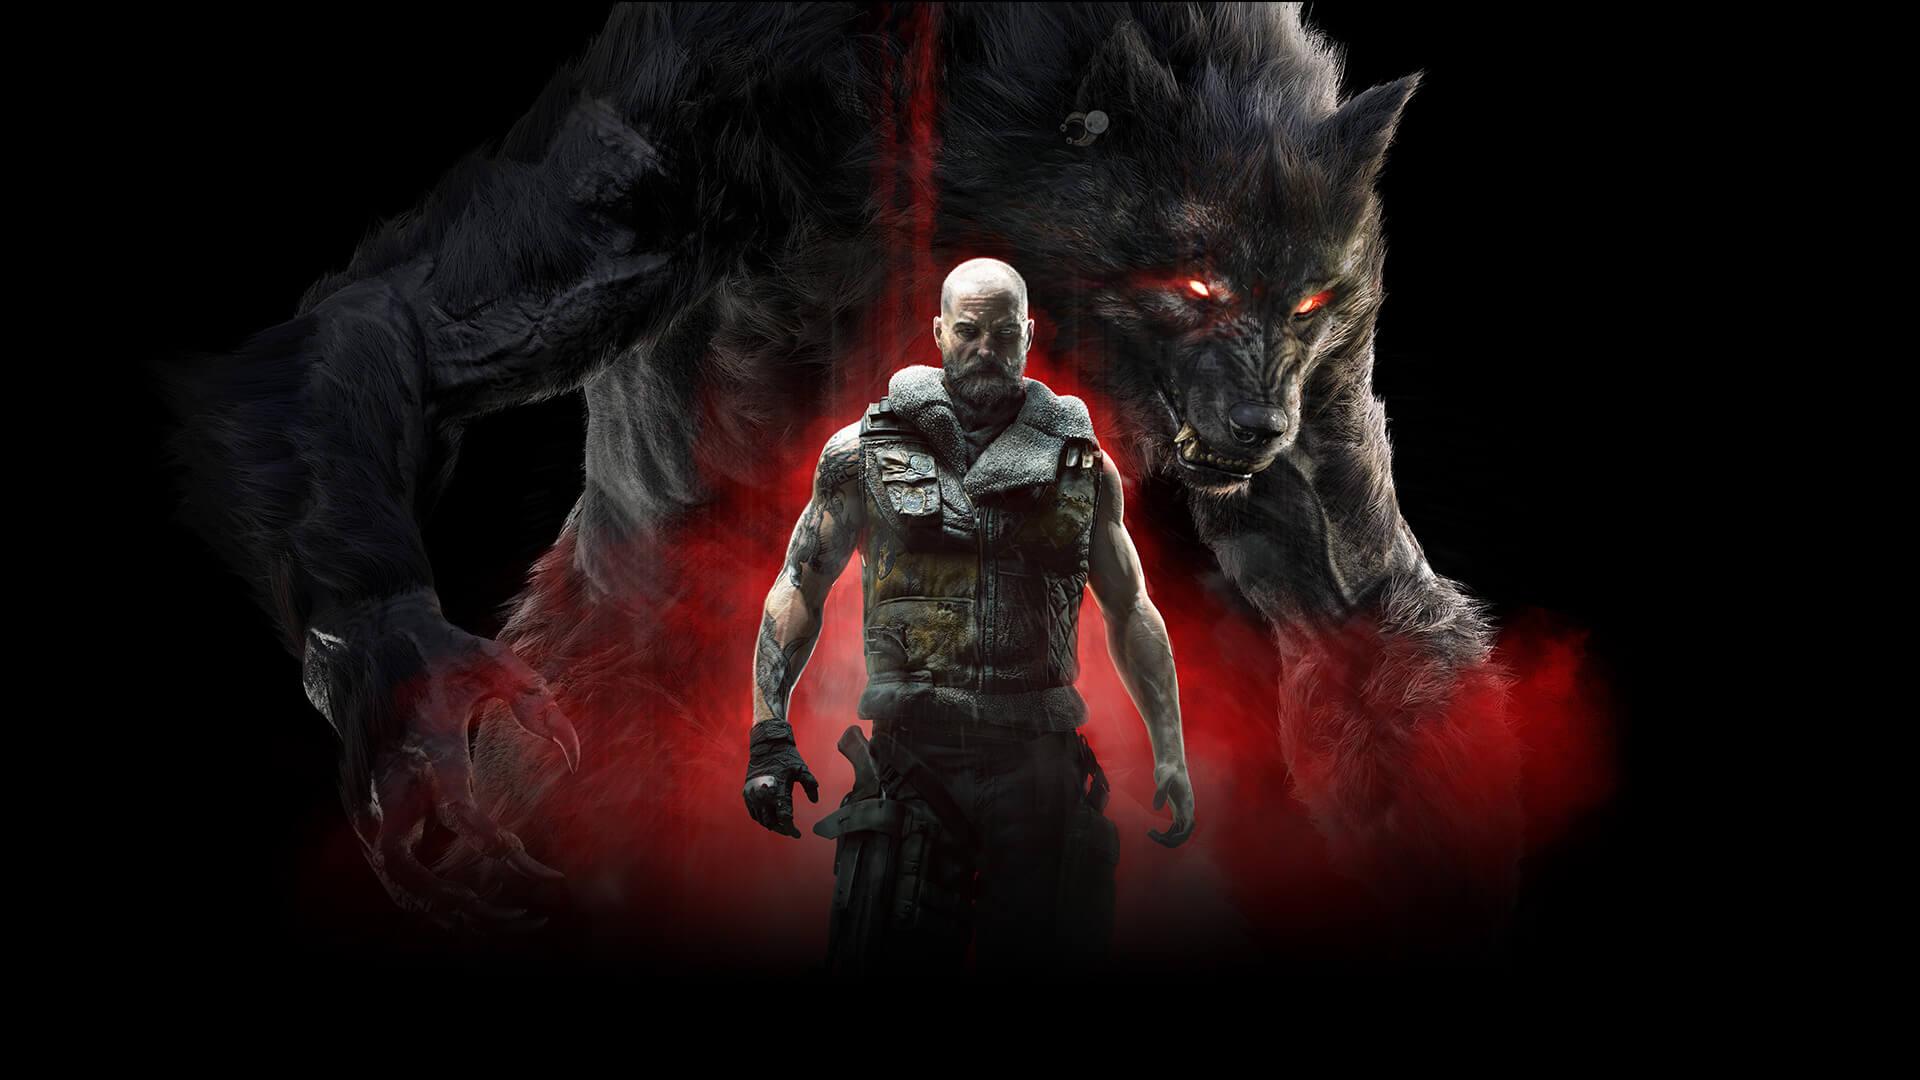 werewolf the apocalypse earthblood game wallpaper 72934